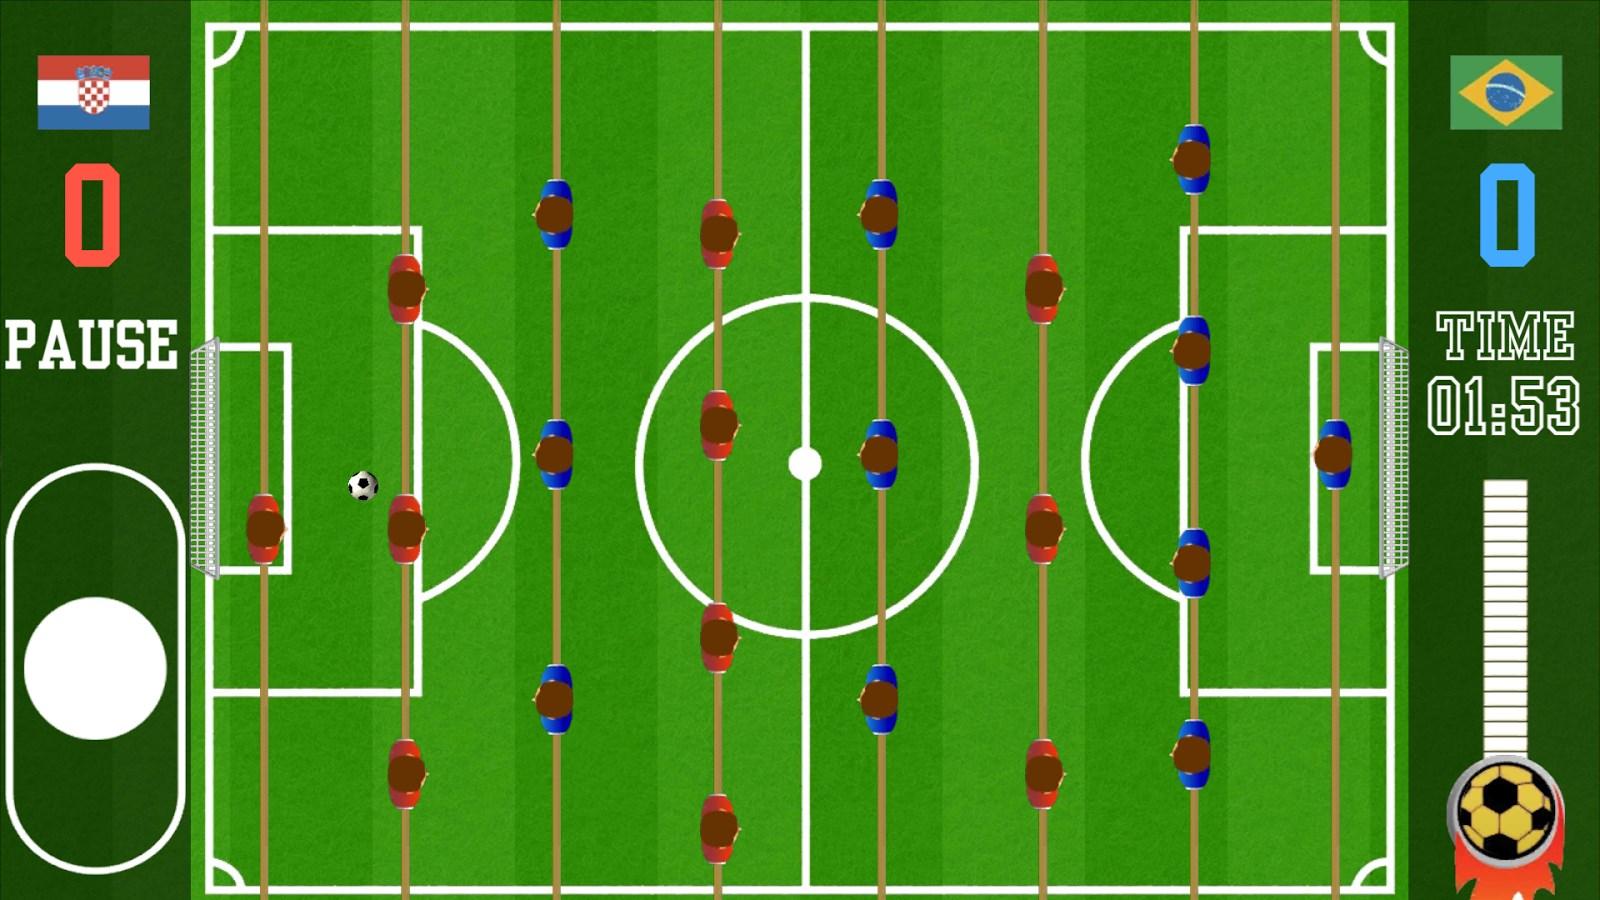 World Foosball Cup 2014 - Imagem 1 do software